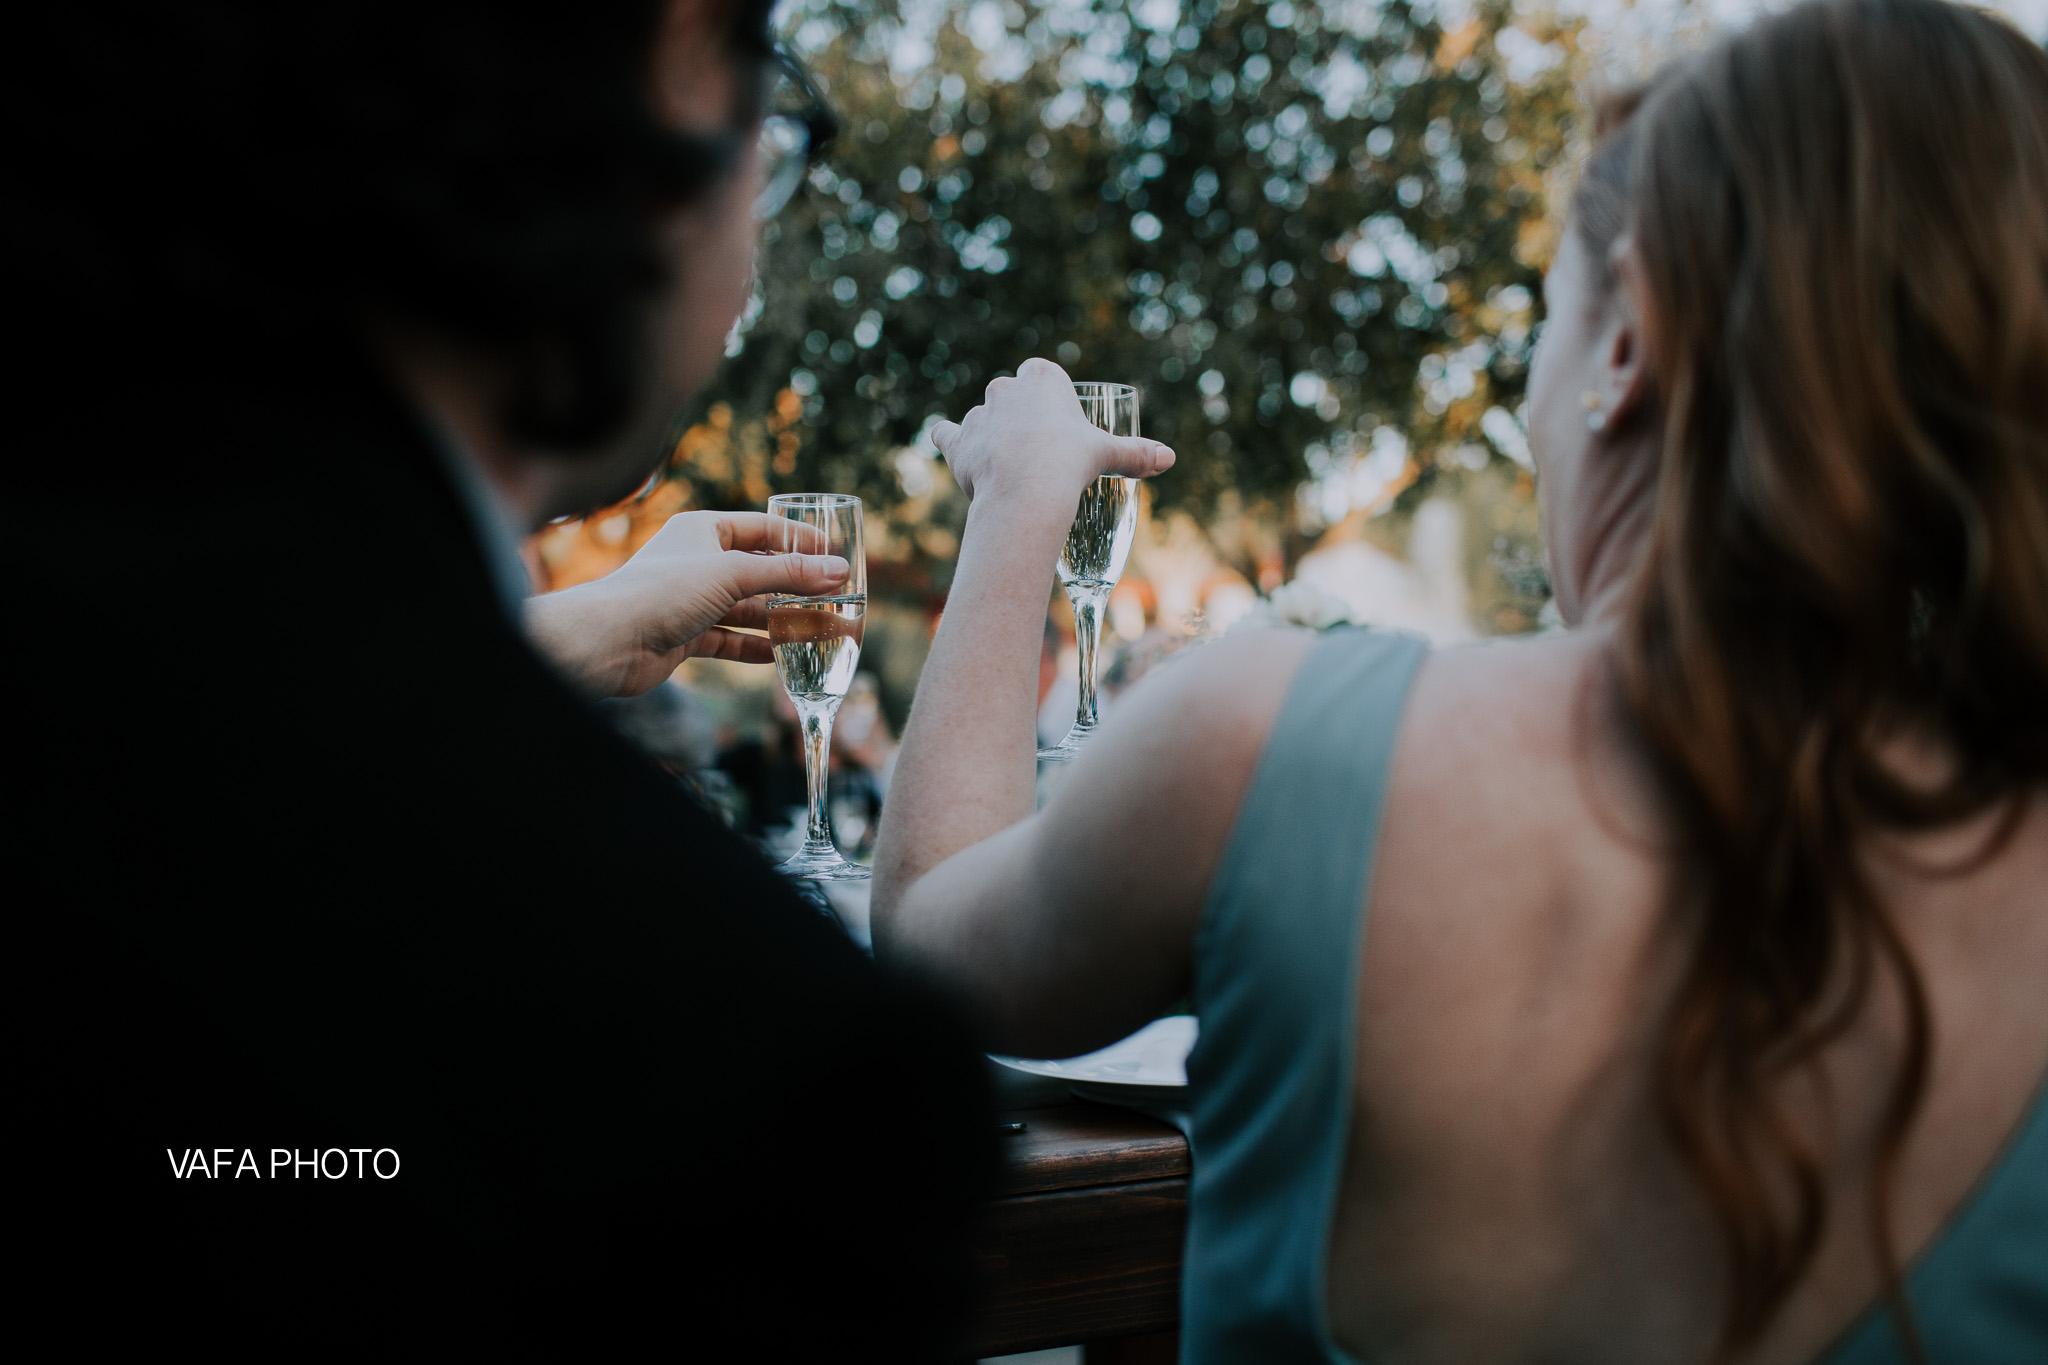 Leo-Carrillo-Ranch-Wedding-Lauren-Mike-Vafa-Photo-977.jpg